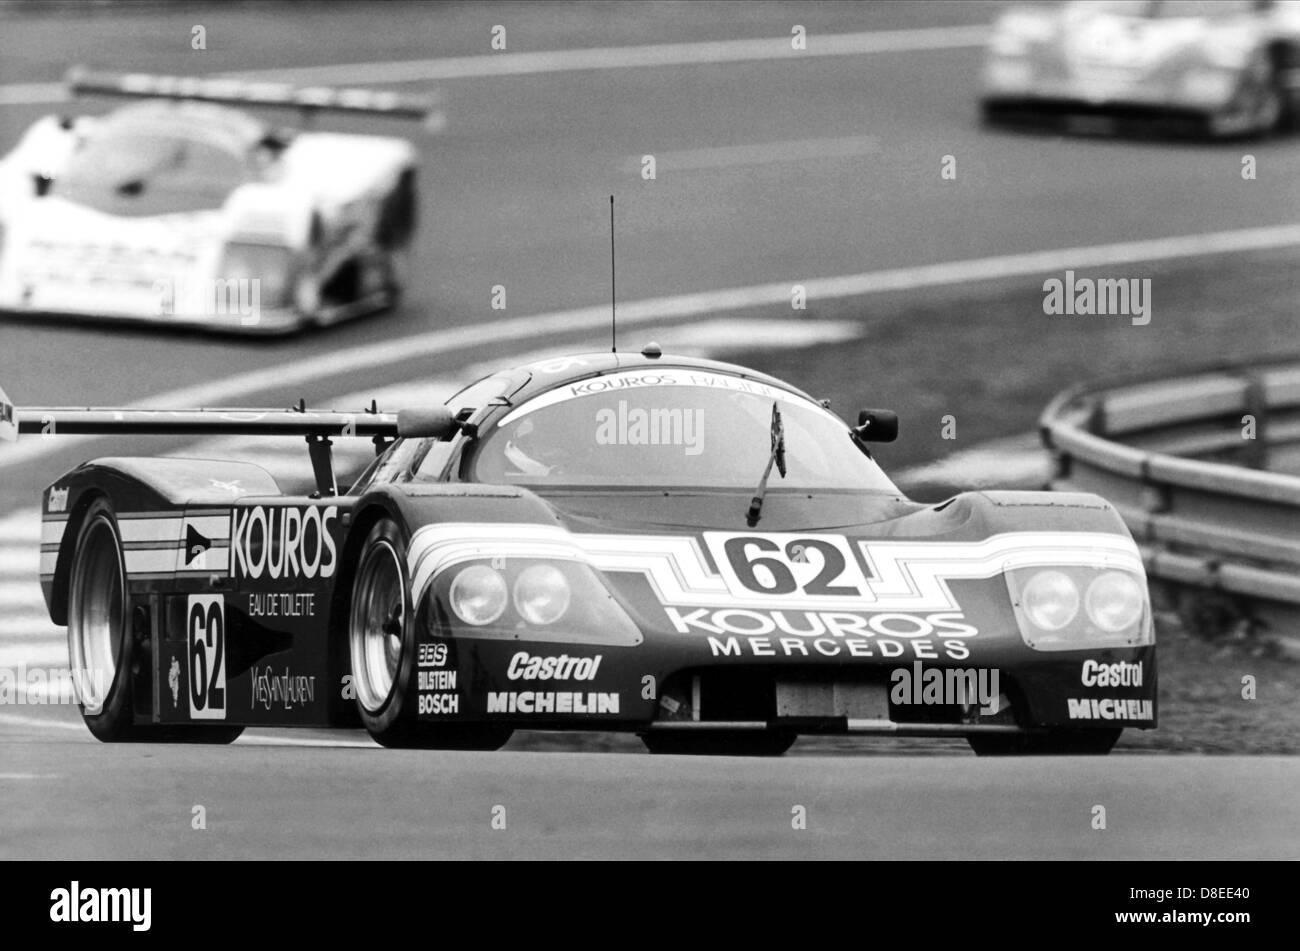 24 H of Le Mans 1986, Pescarolo / Danner / Quester, Mercedes Kouros. - Stock Image